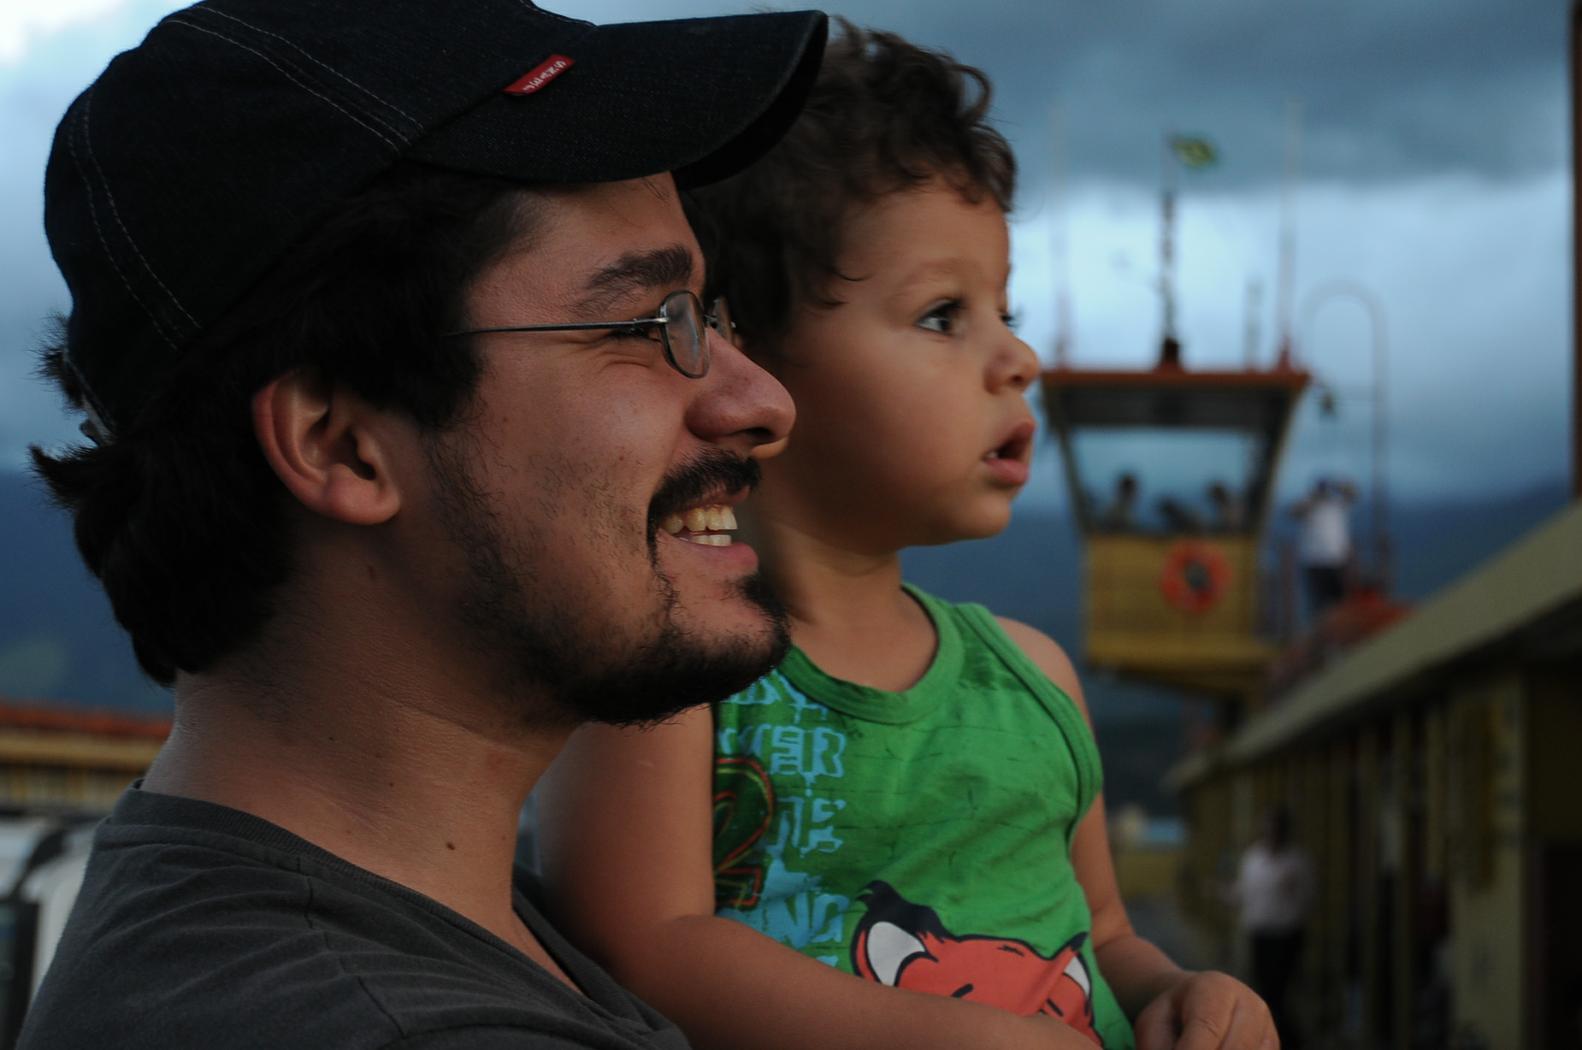 Maico Andrade